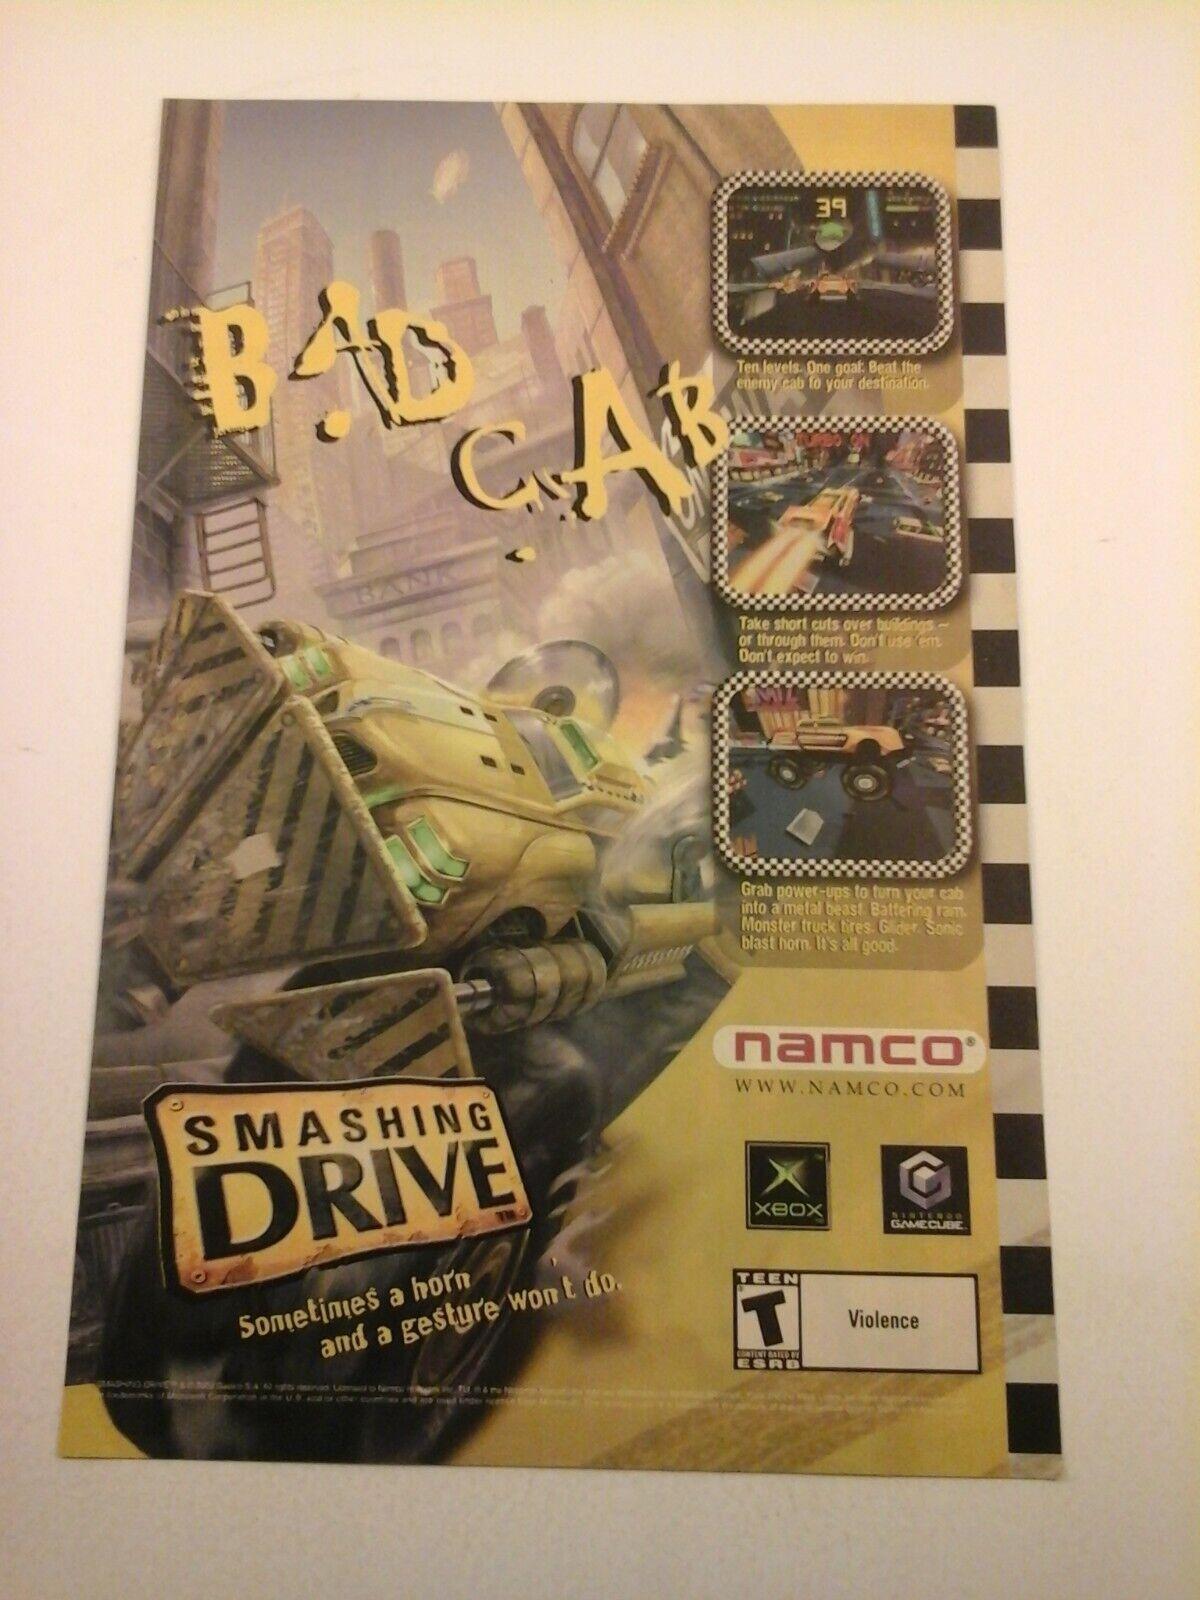 2001 Video Game Print Ad - Smashing Drive - XBOX GAMECUBE NAMCO - $7.98